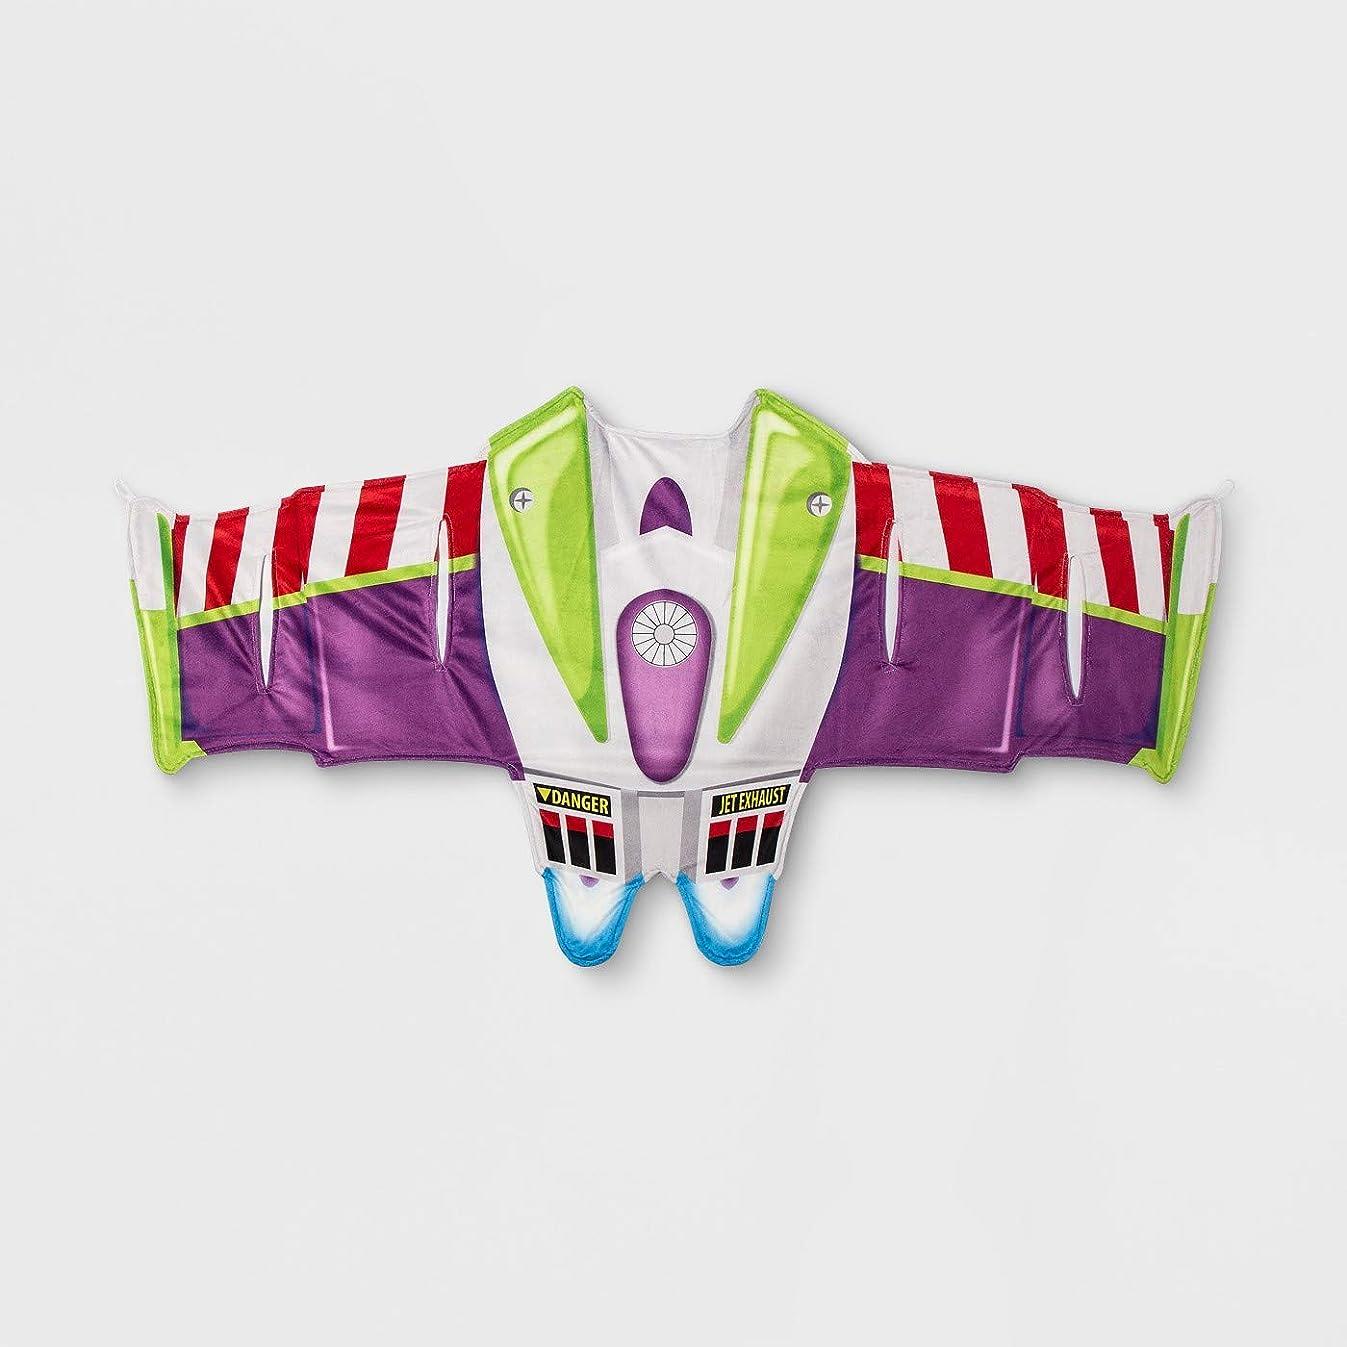 Cozy Wings Buzz Lightyear Toy Story As Seen On TV